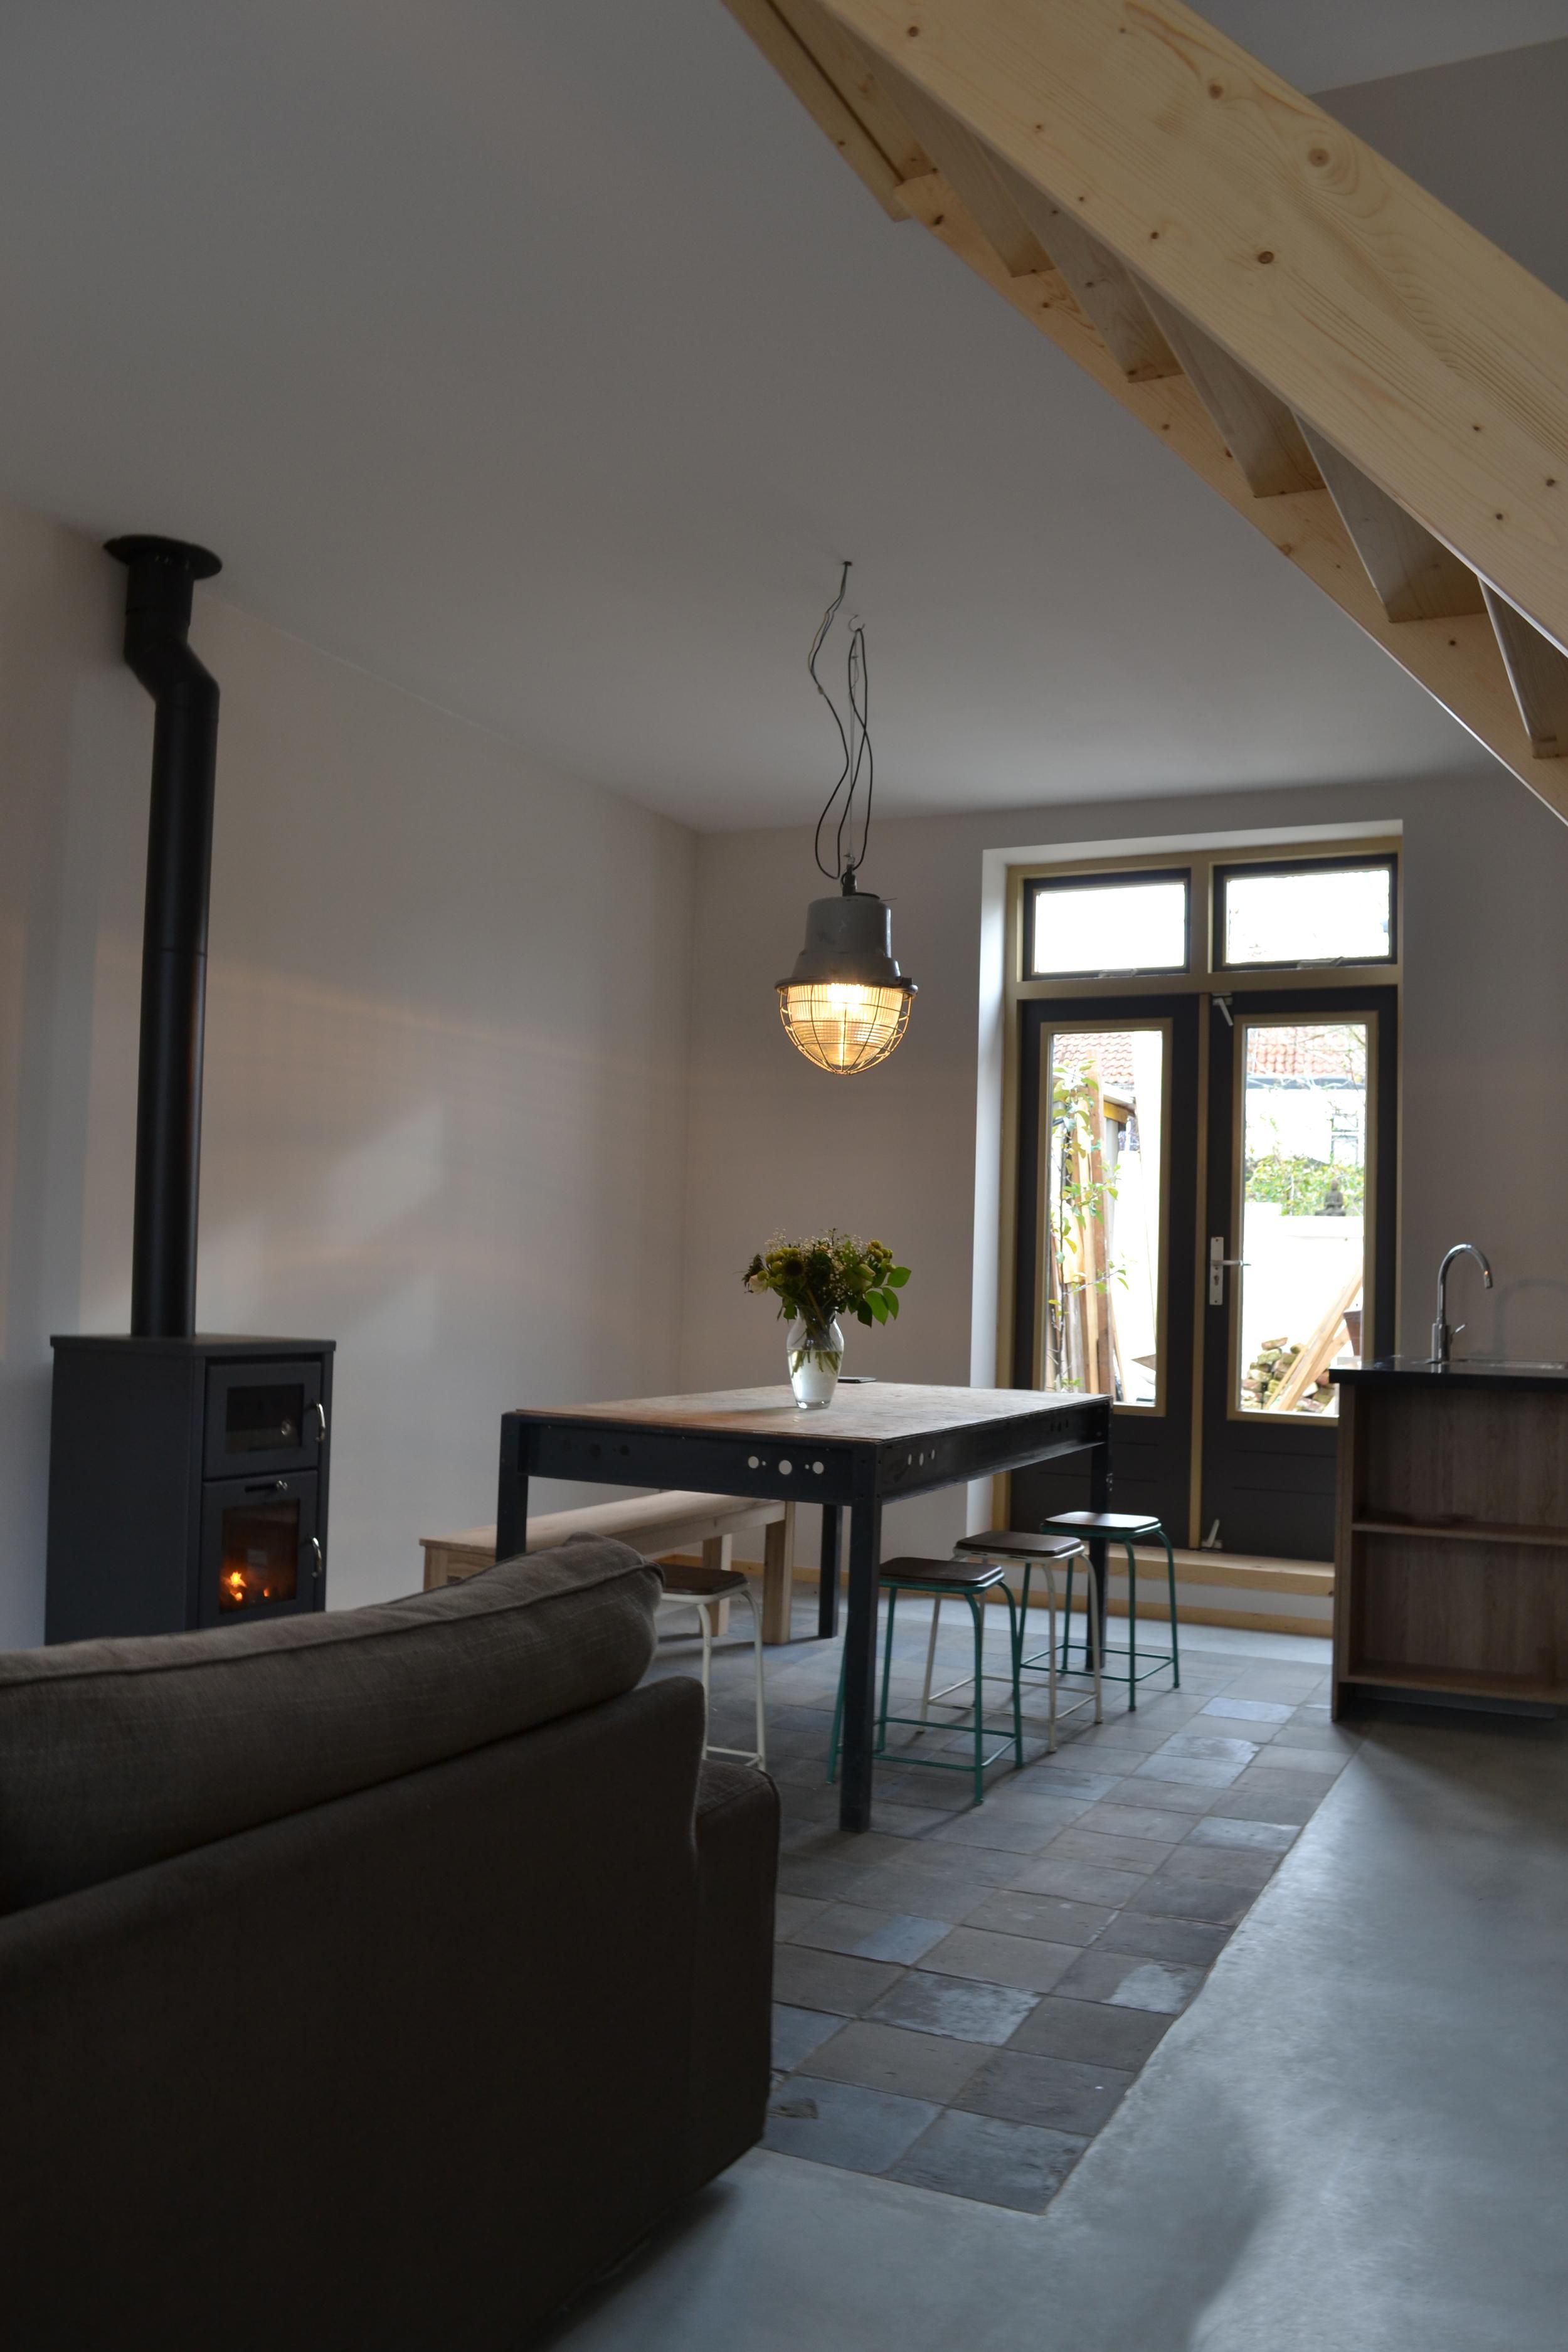 Daniel van Dijck - Private Home